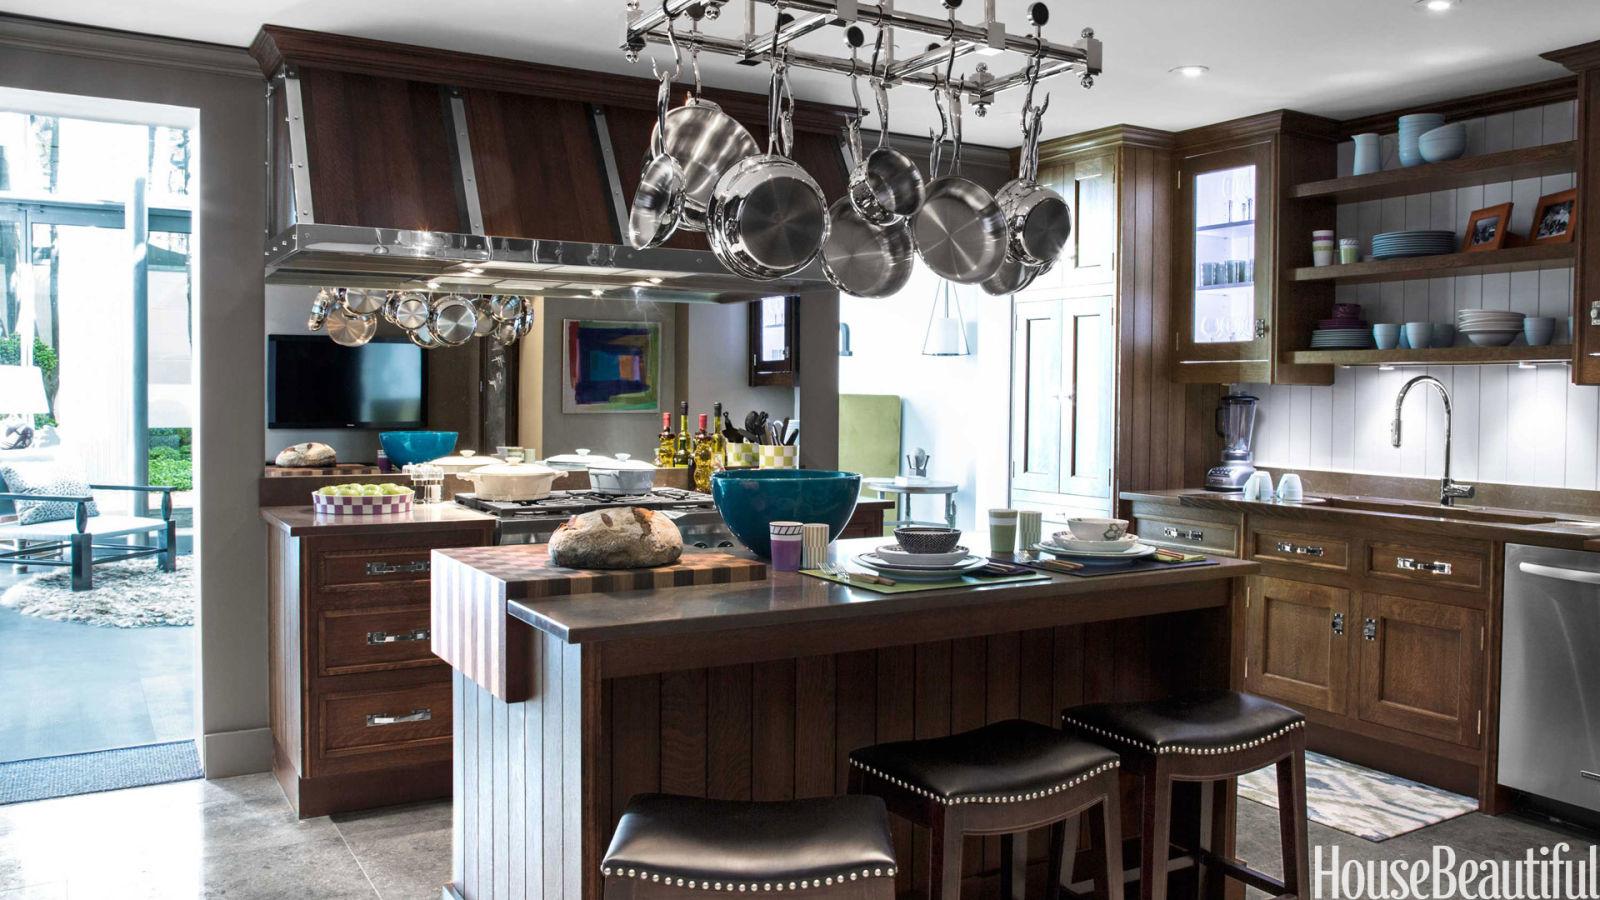 Christopher Peacock Kitchen Design Kitchen Of The Year - Home design kitchen